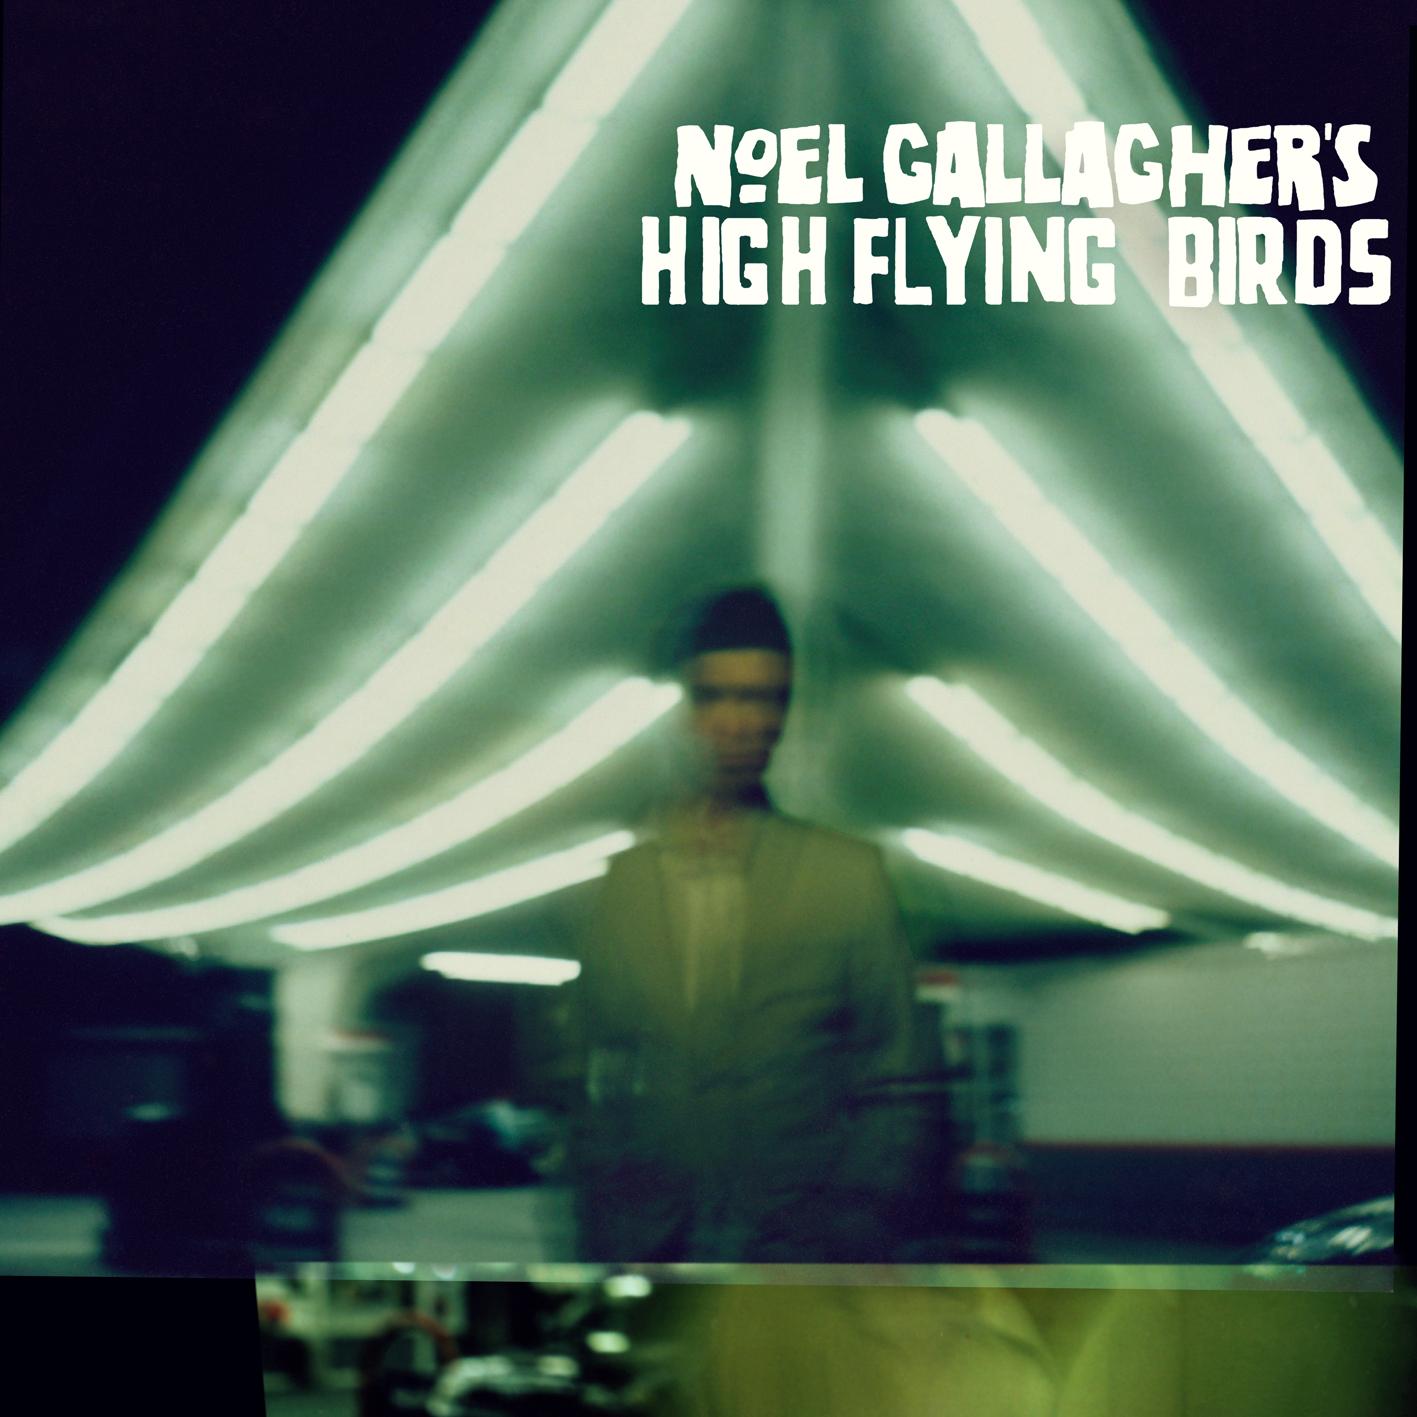 noel_gallagher_high_flying_birds_album_cover_location_beverly_hills